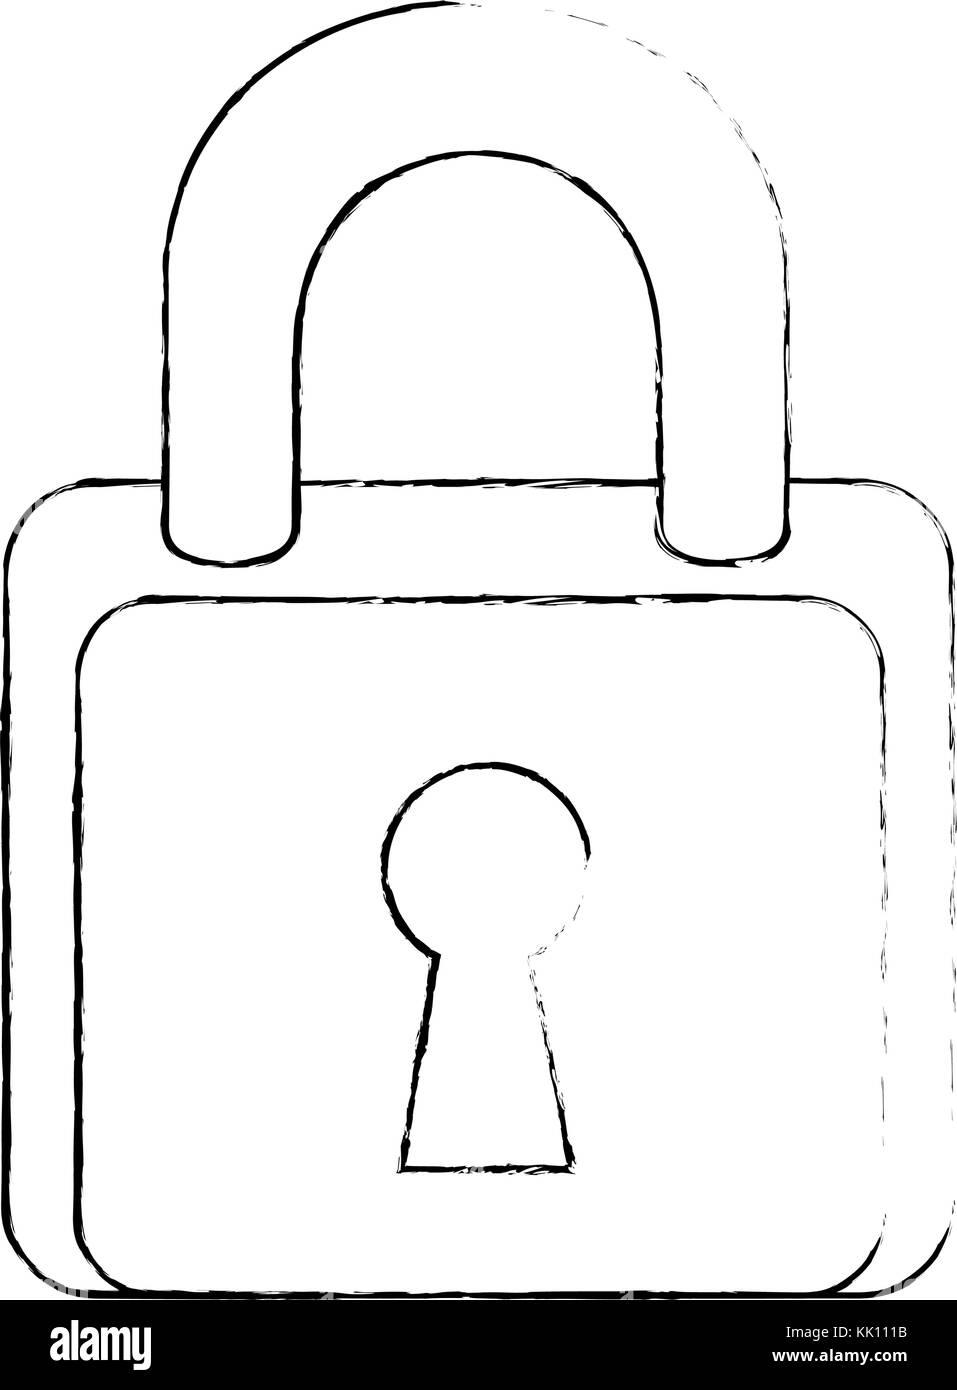 padlock security isolated icon - Stock Image